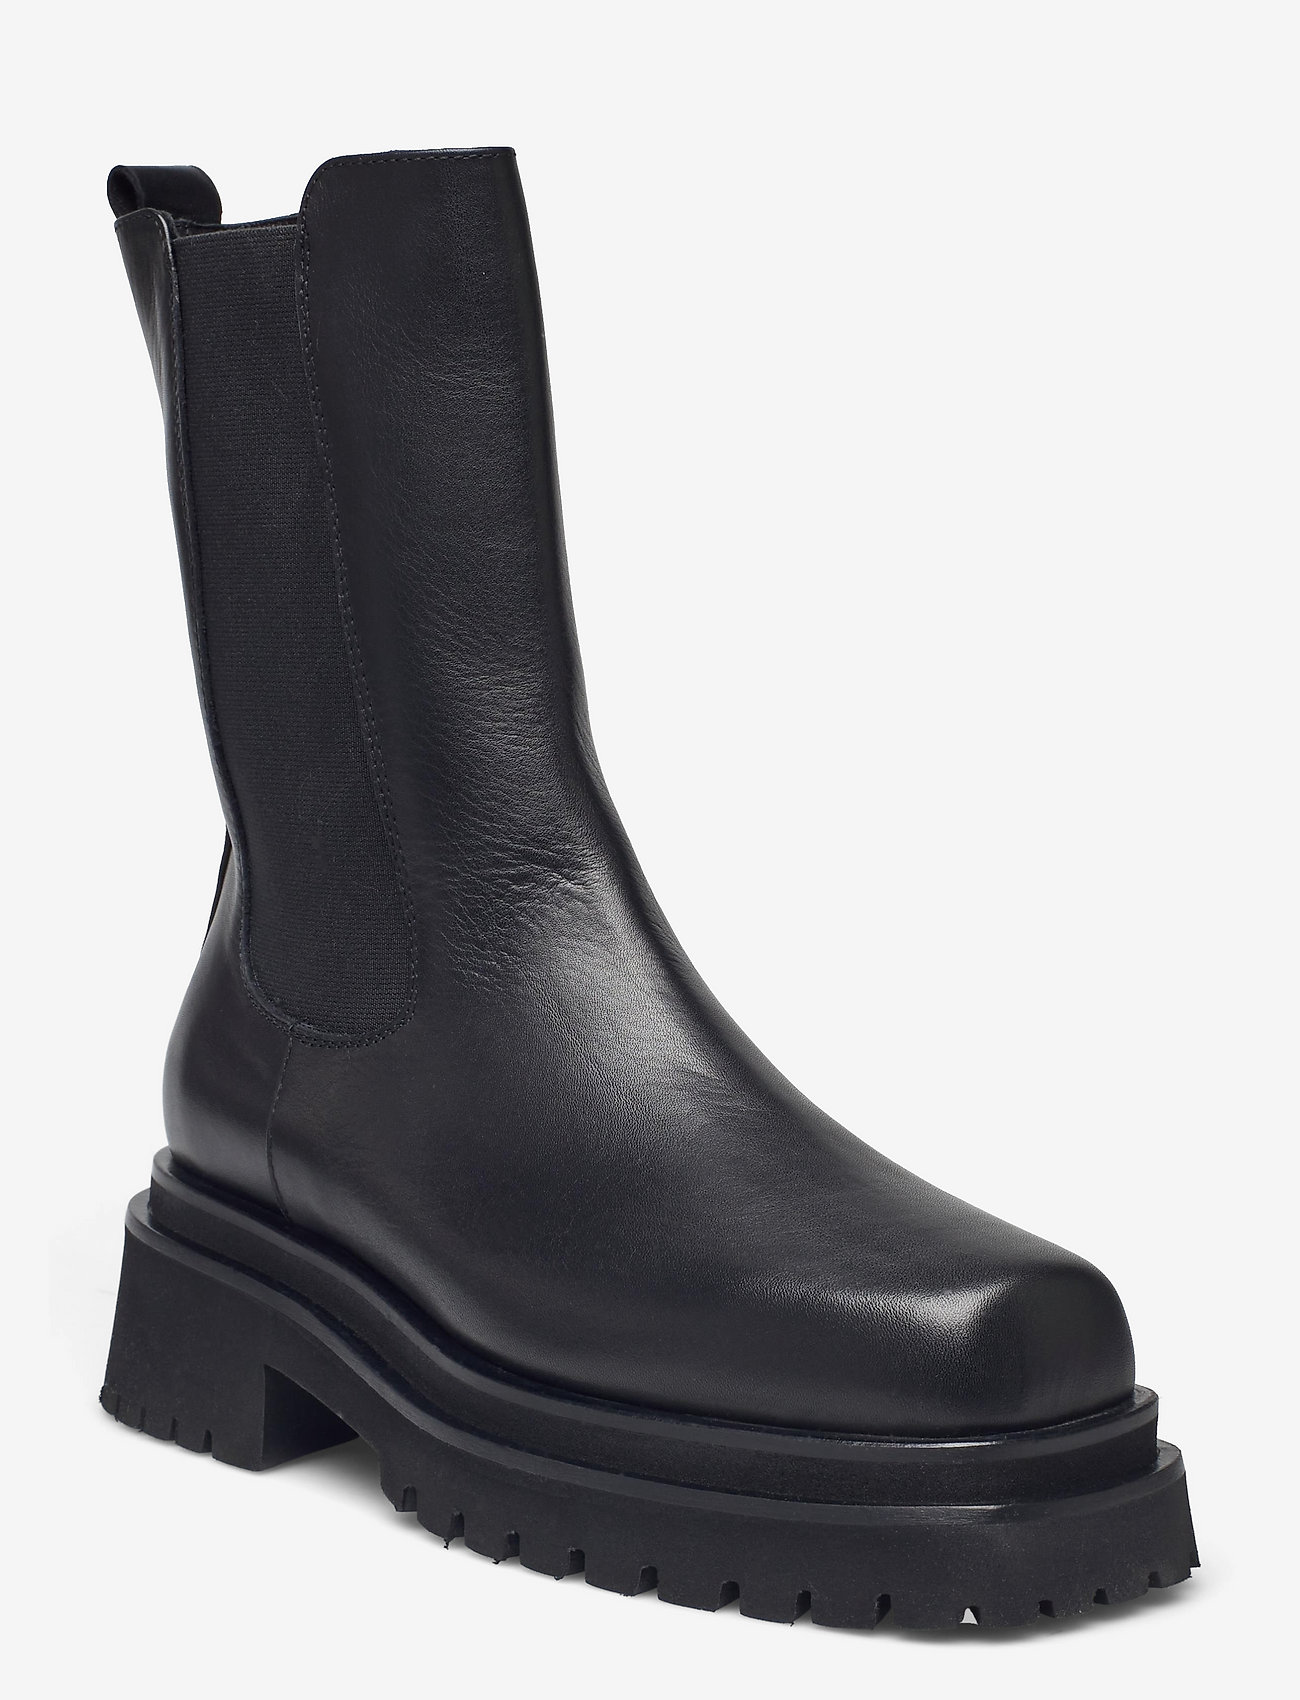 Nude of Scandinavia - VILMA - chelsea boots - osaka / nero - 0